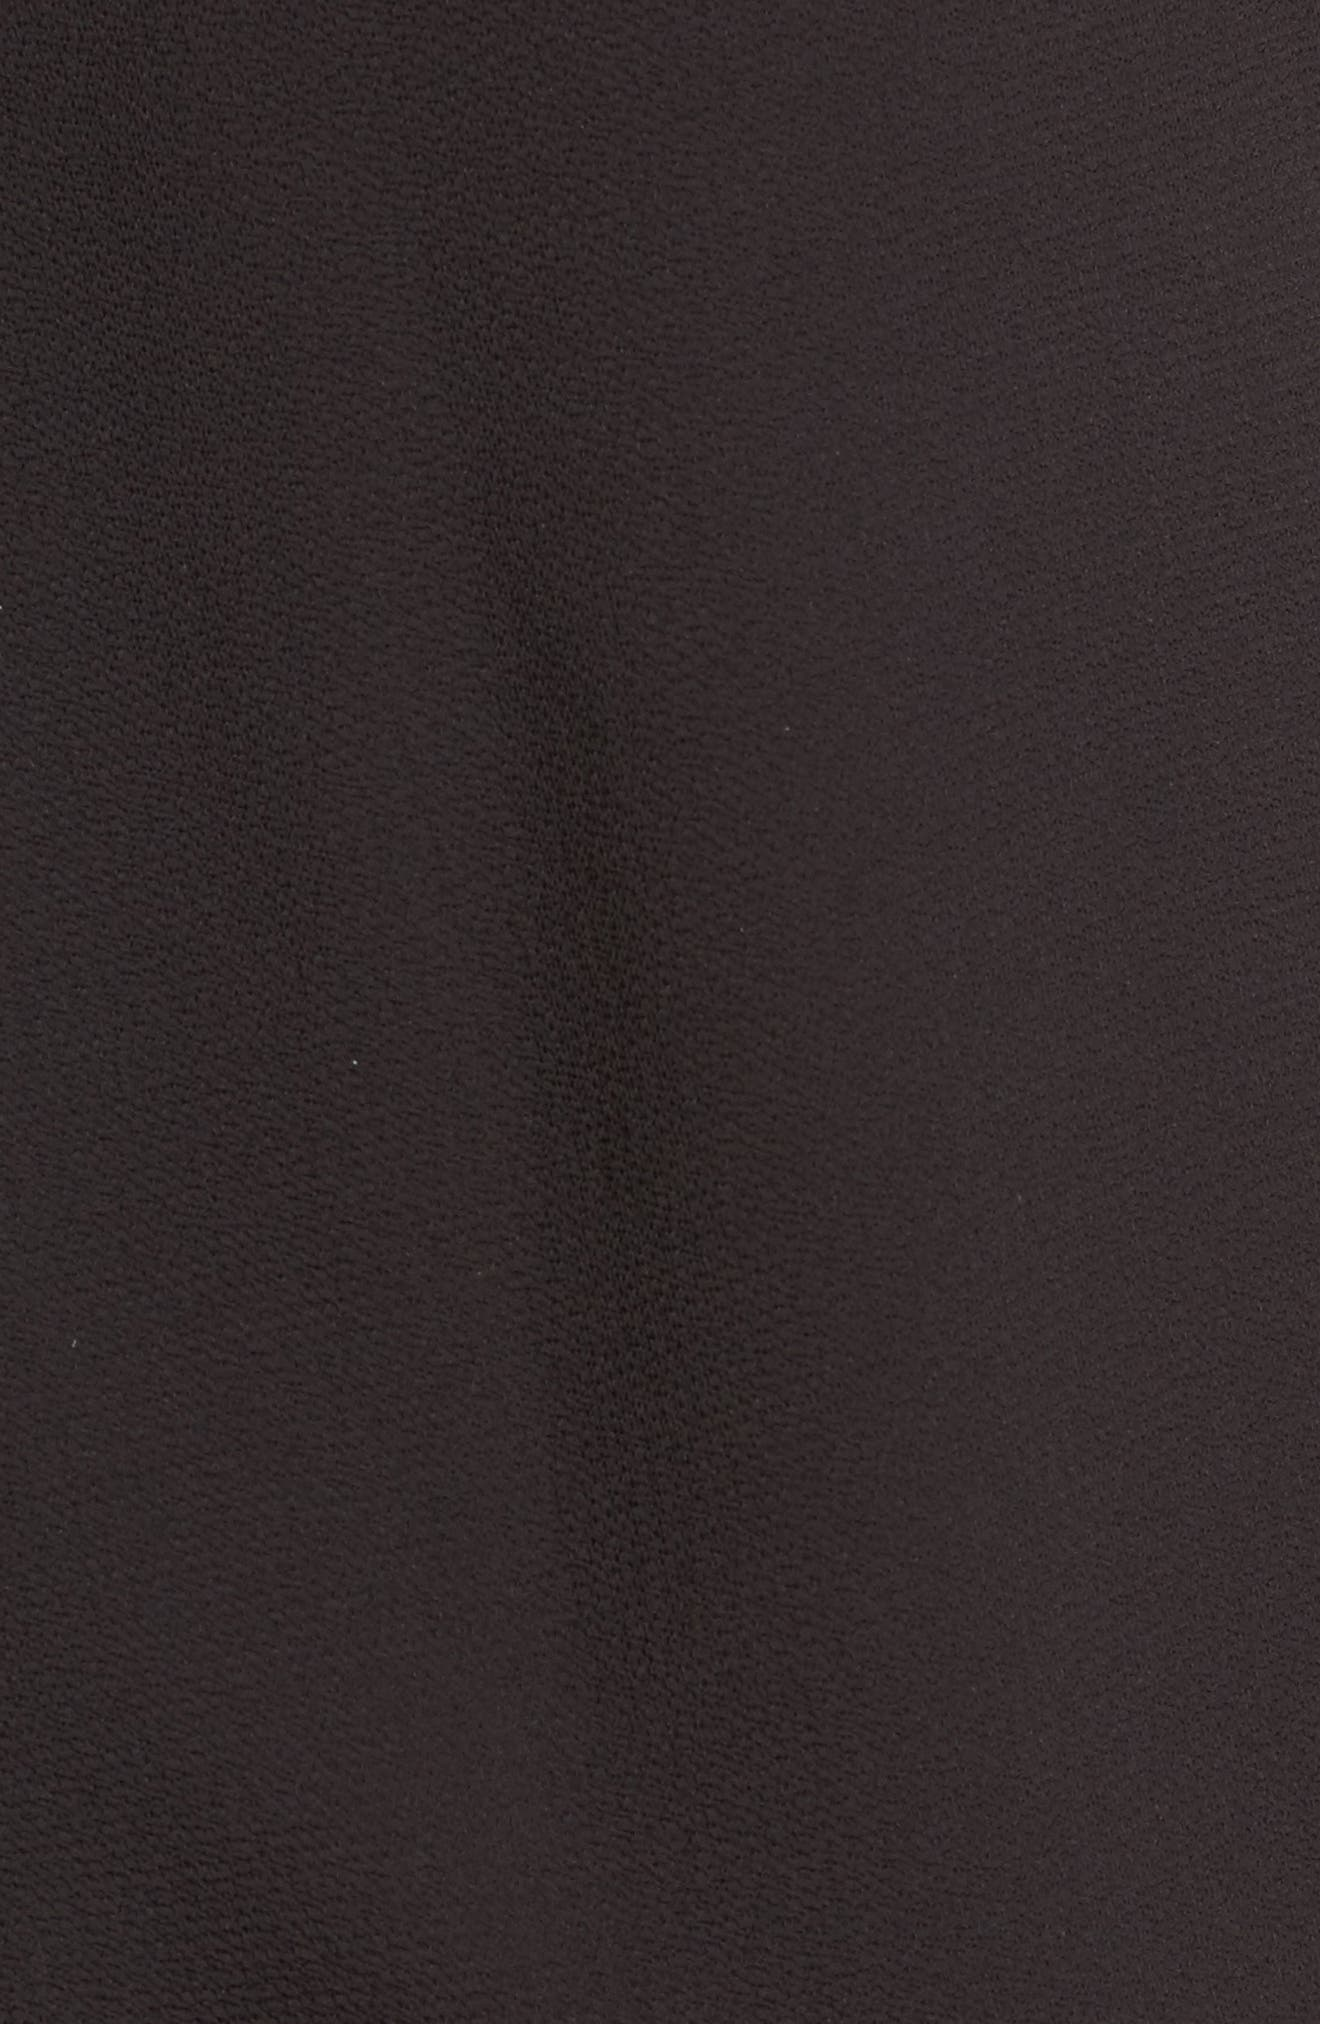 High/Low Wrap Top,                             Alternate thumbnail 5, color,                             Black